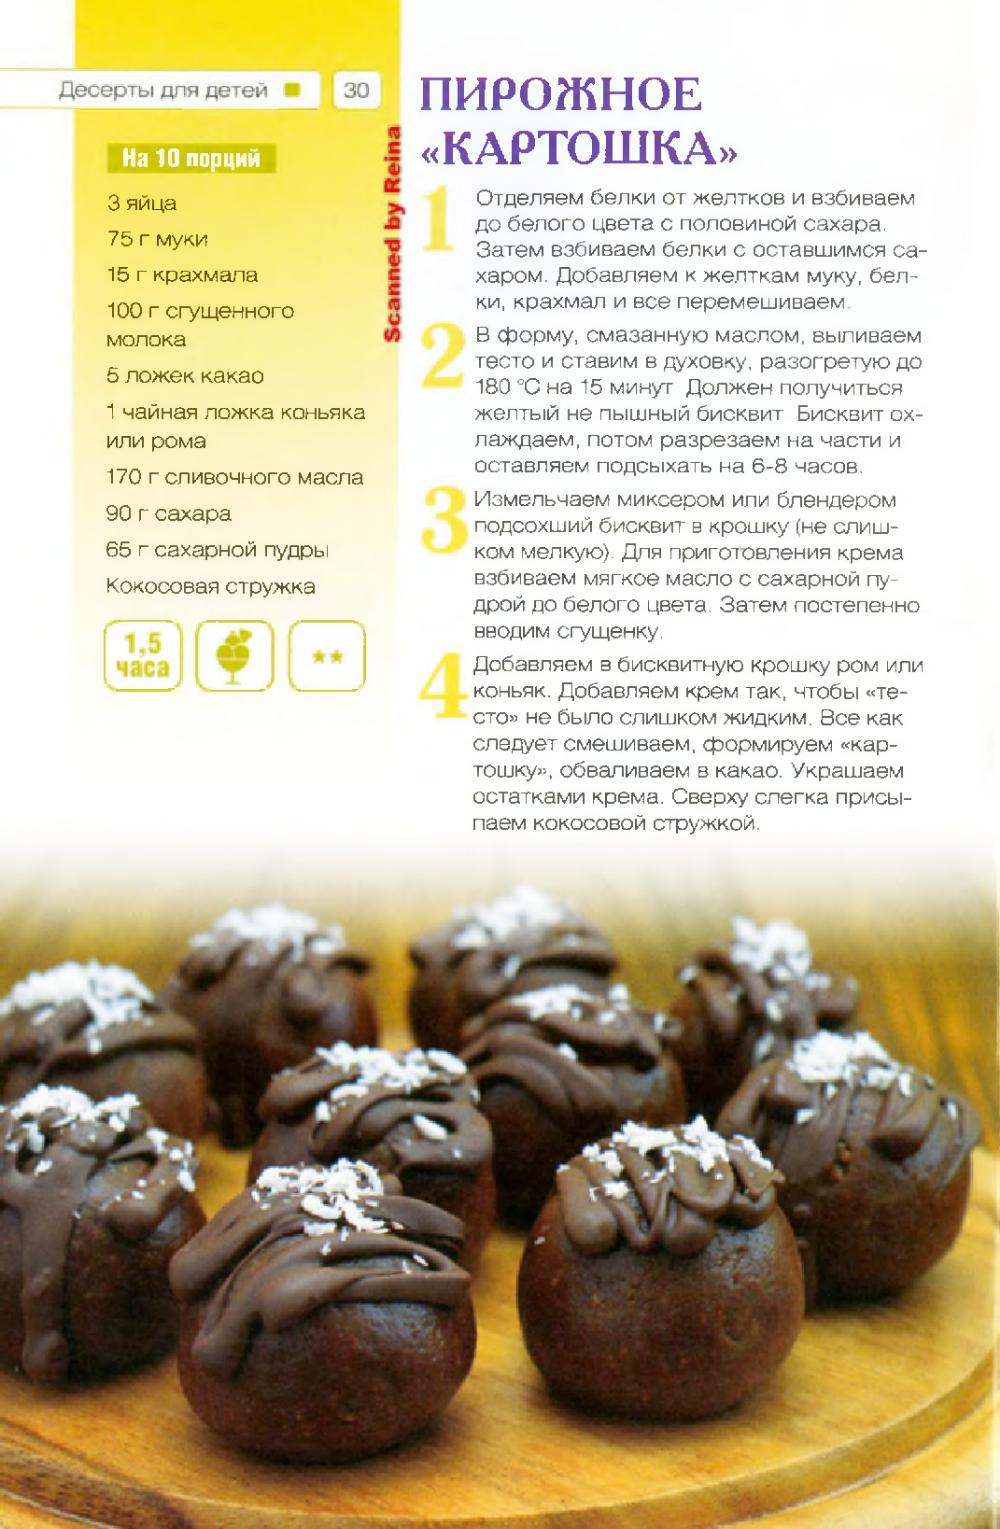 http://i5.imageban.ru/out/2013/12/06/a6e500a5640f55468a1c59b0ff634a84.jpg